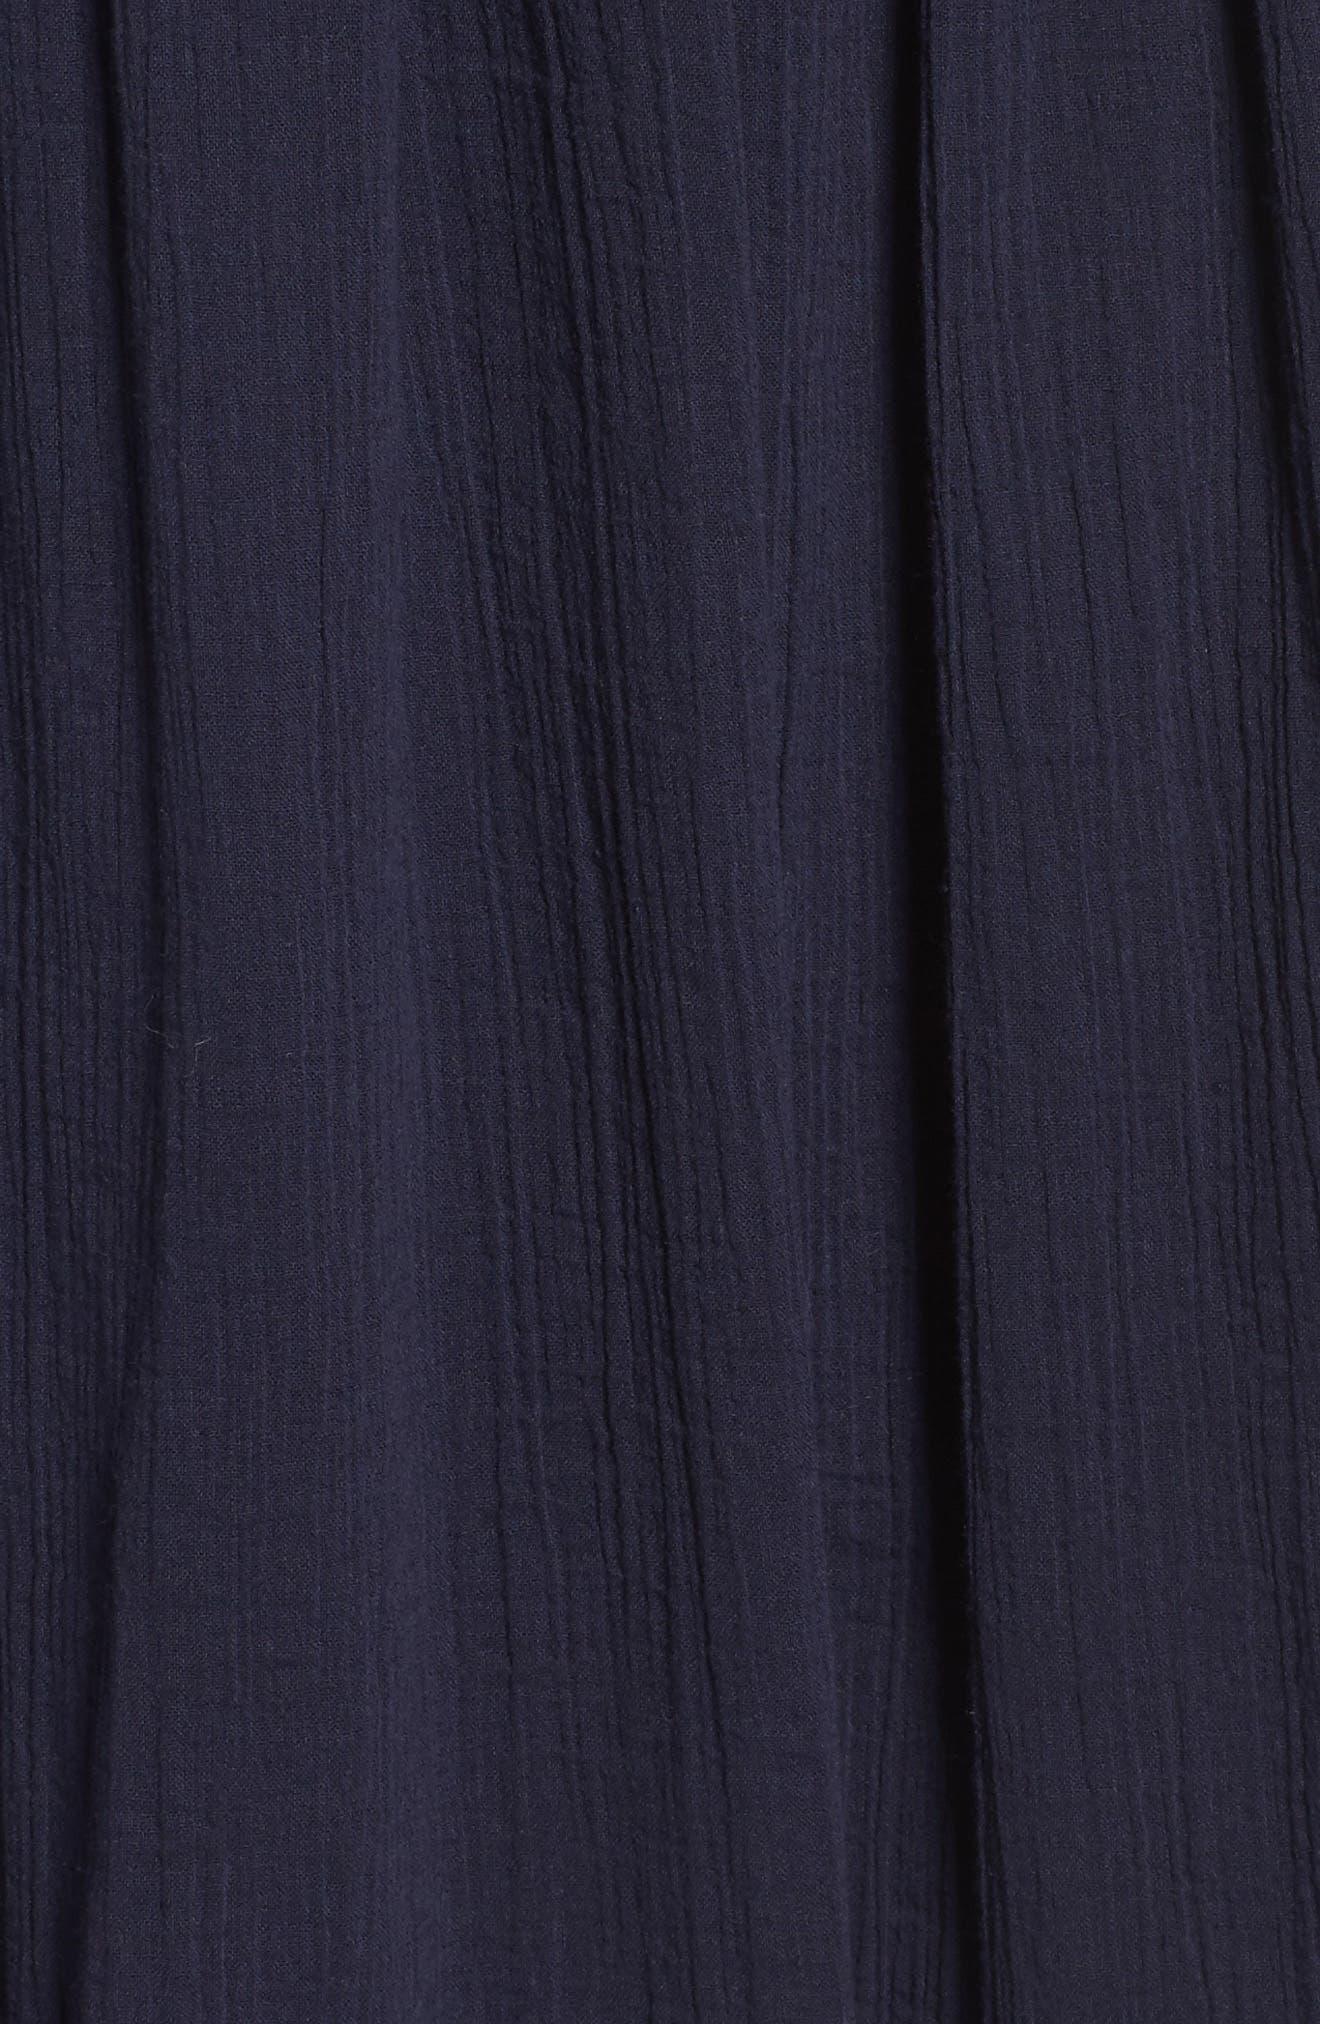 Halter Midi Dress,                             Alternate thumbnail 5, color,                             Navy